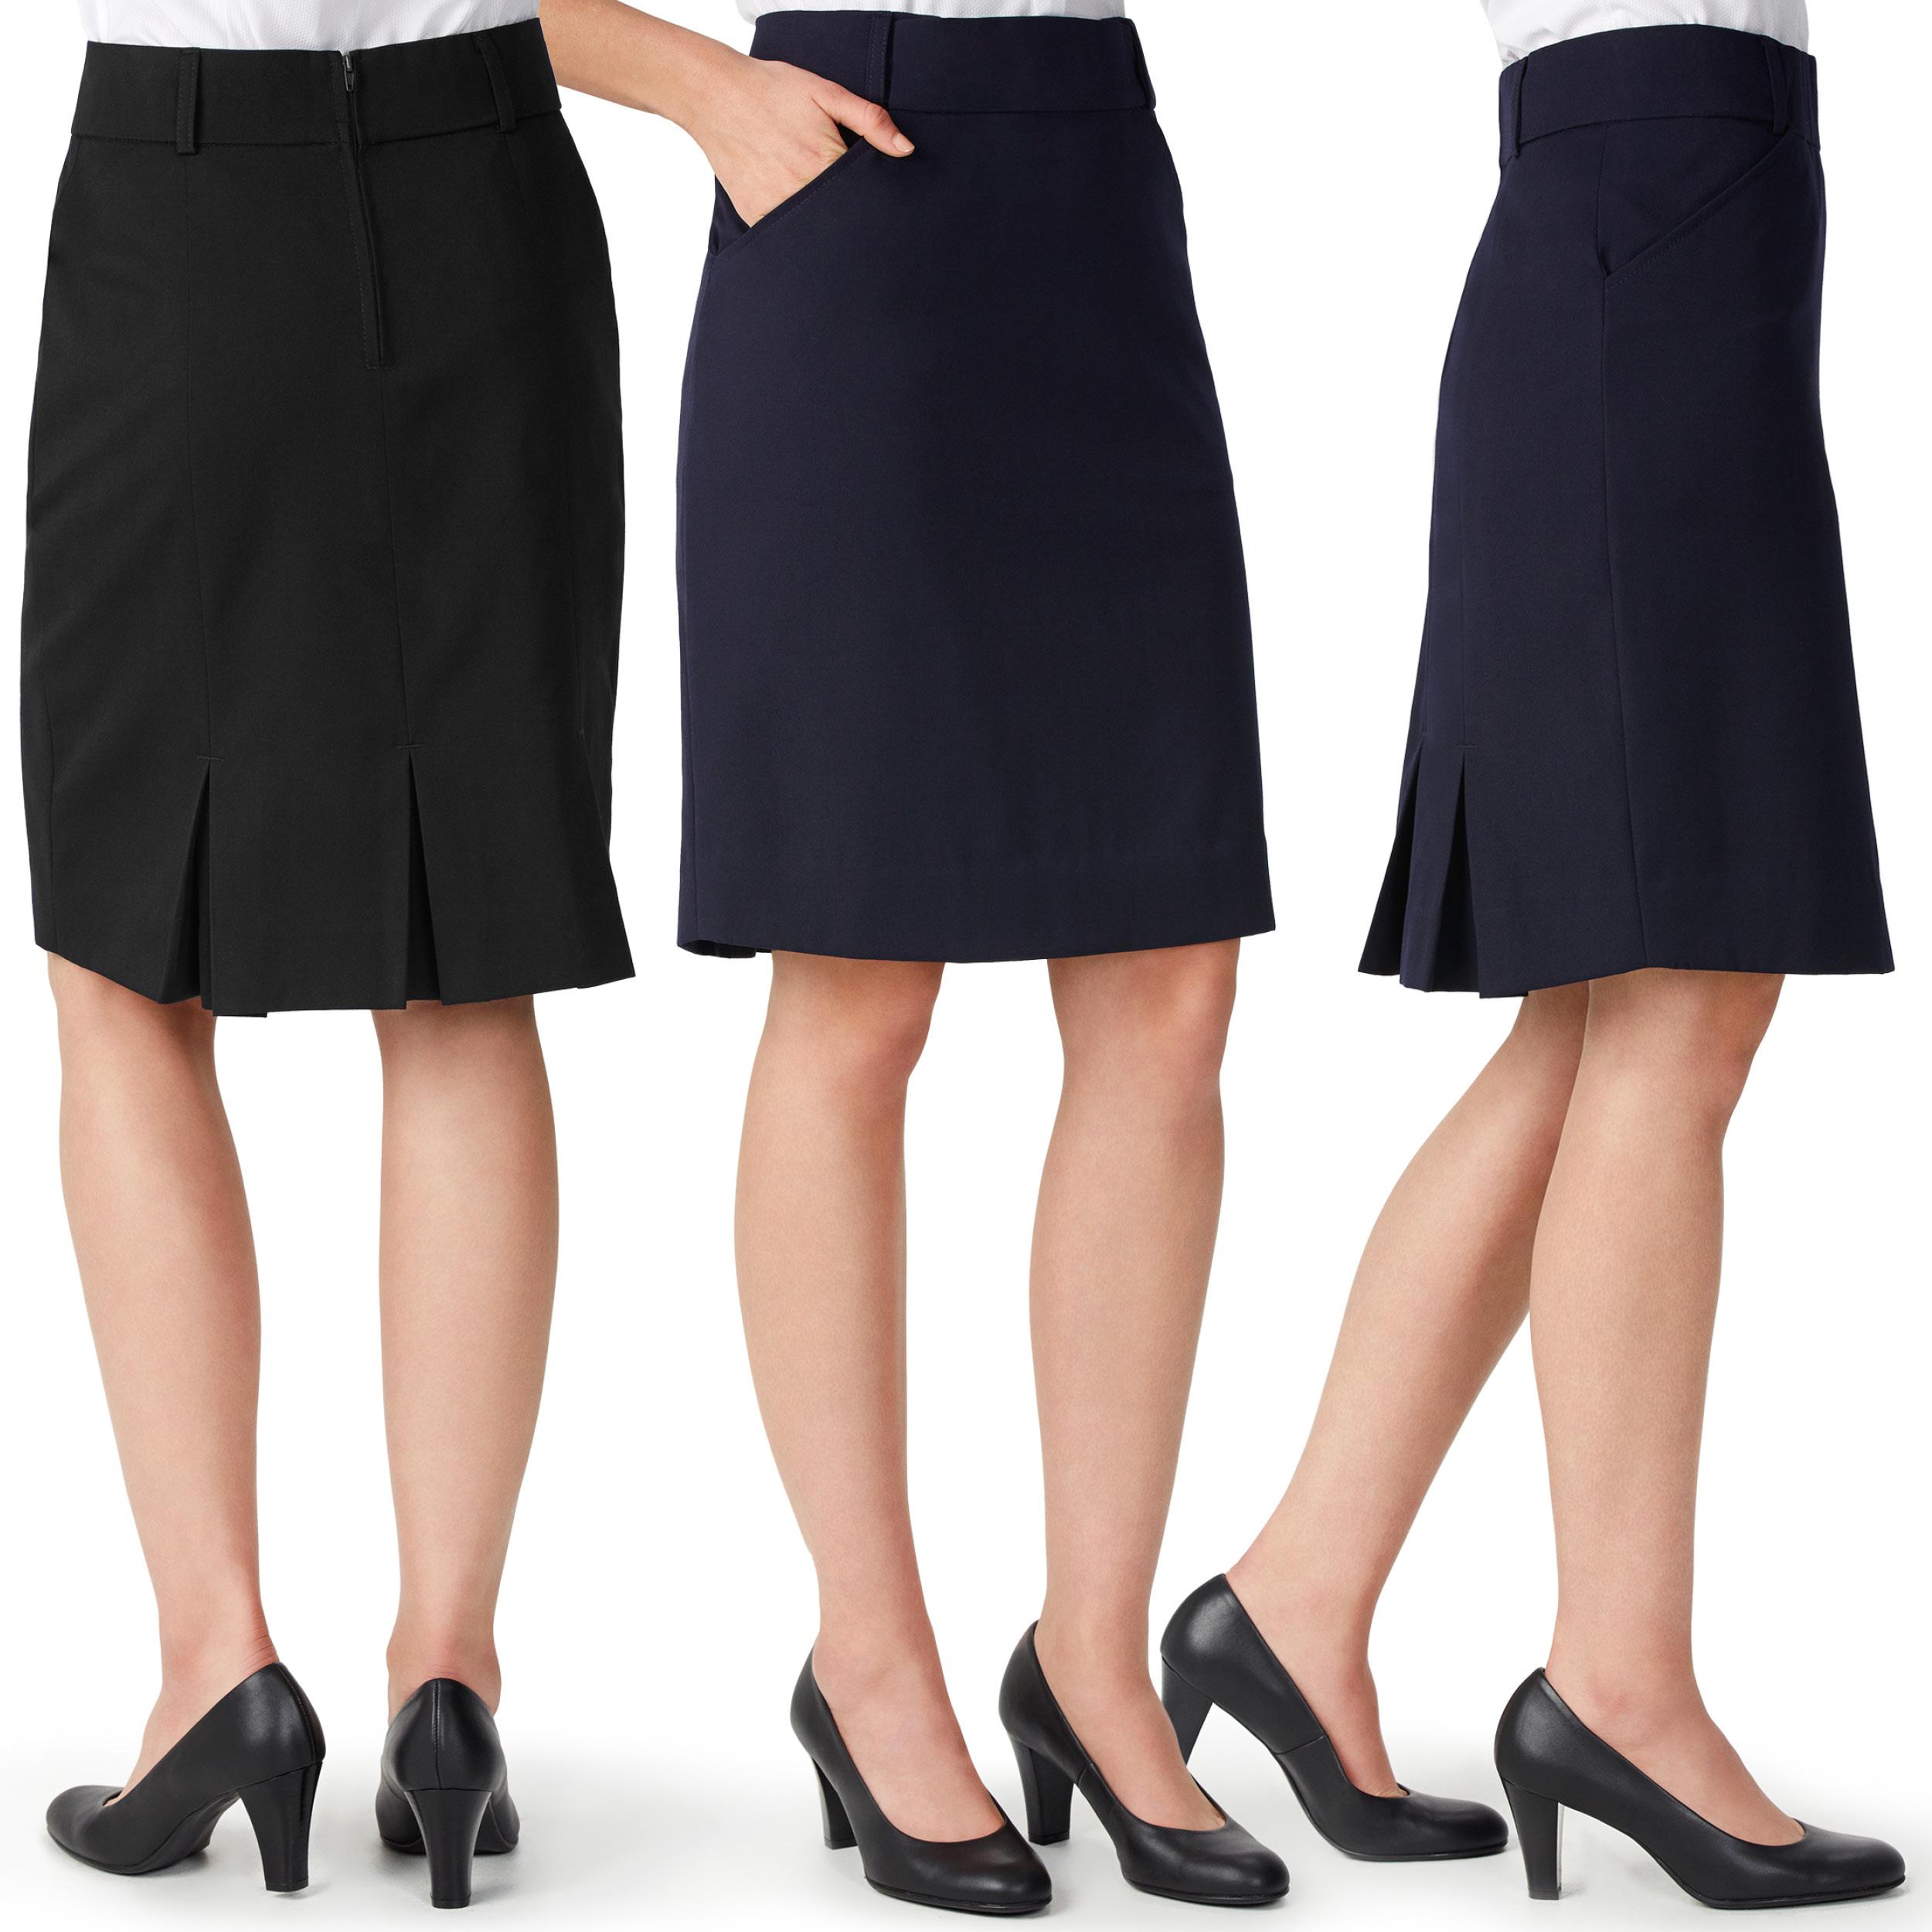 Biz Skirts